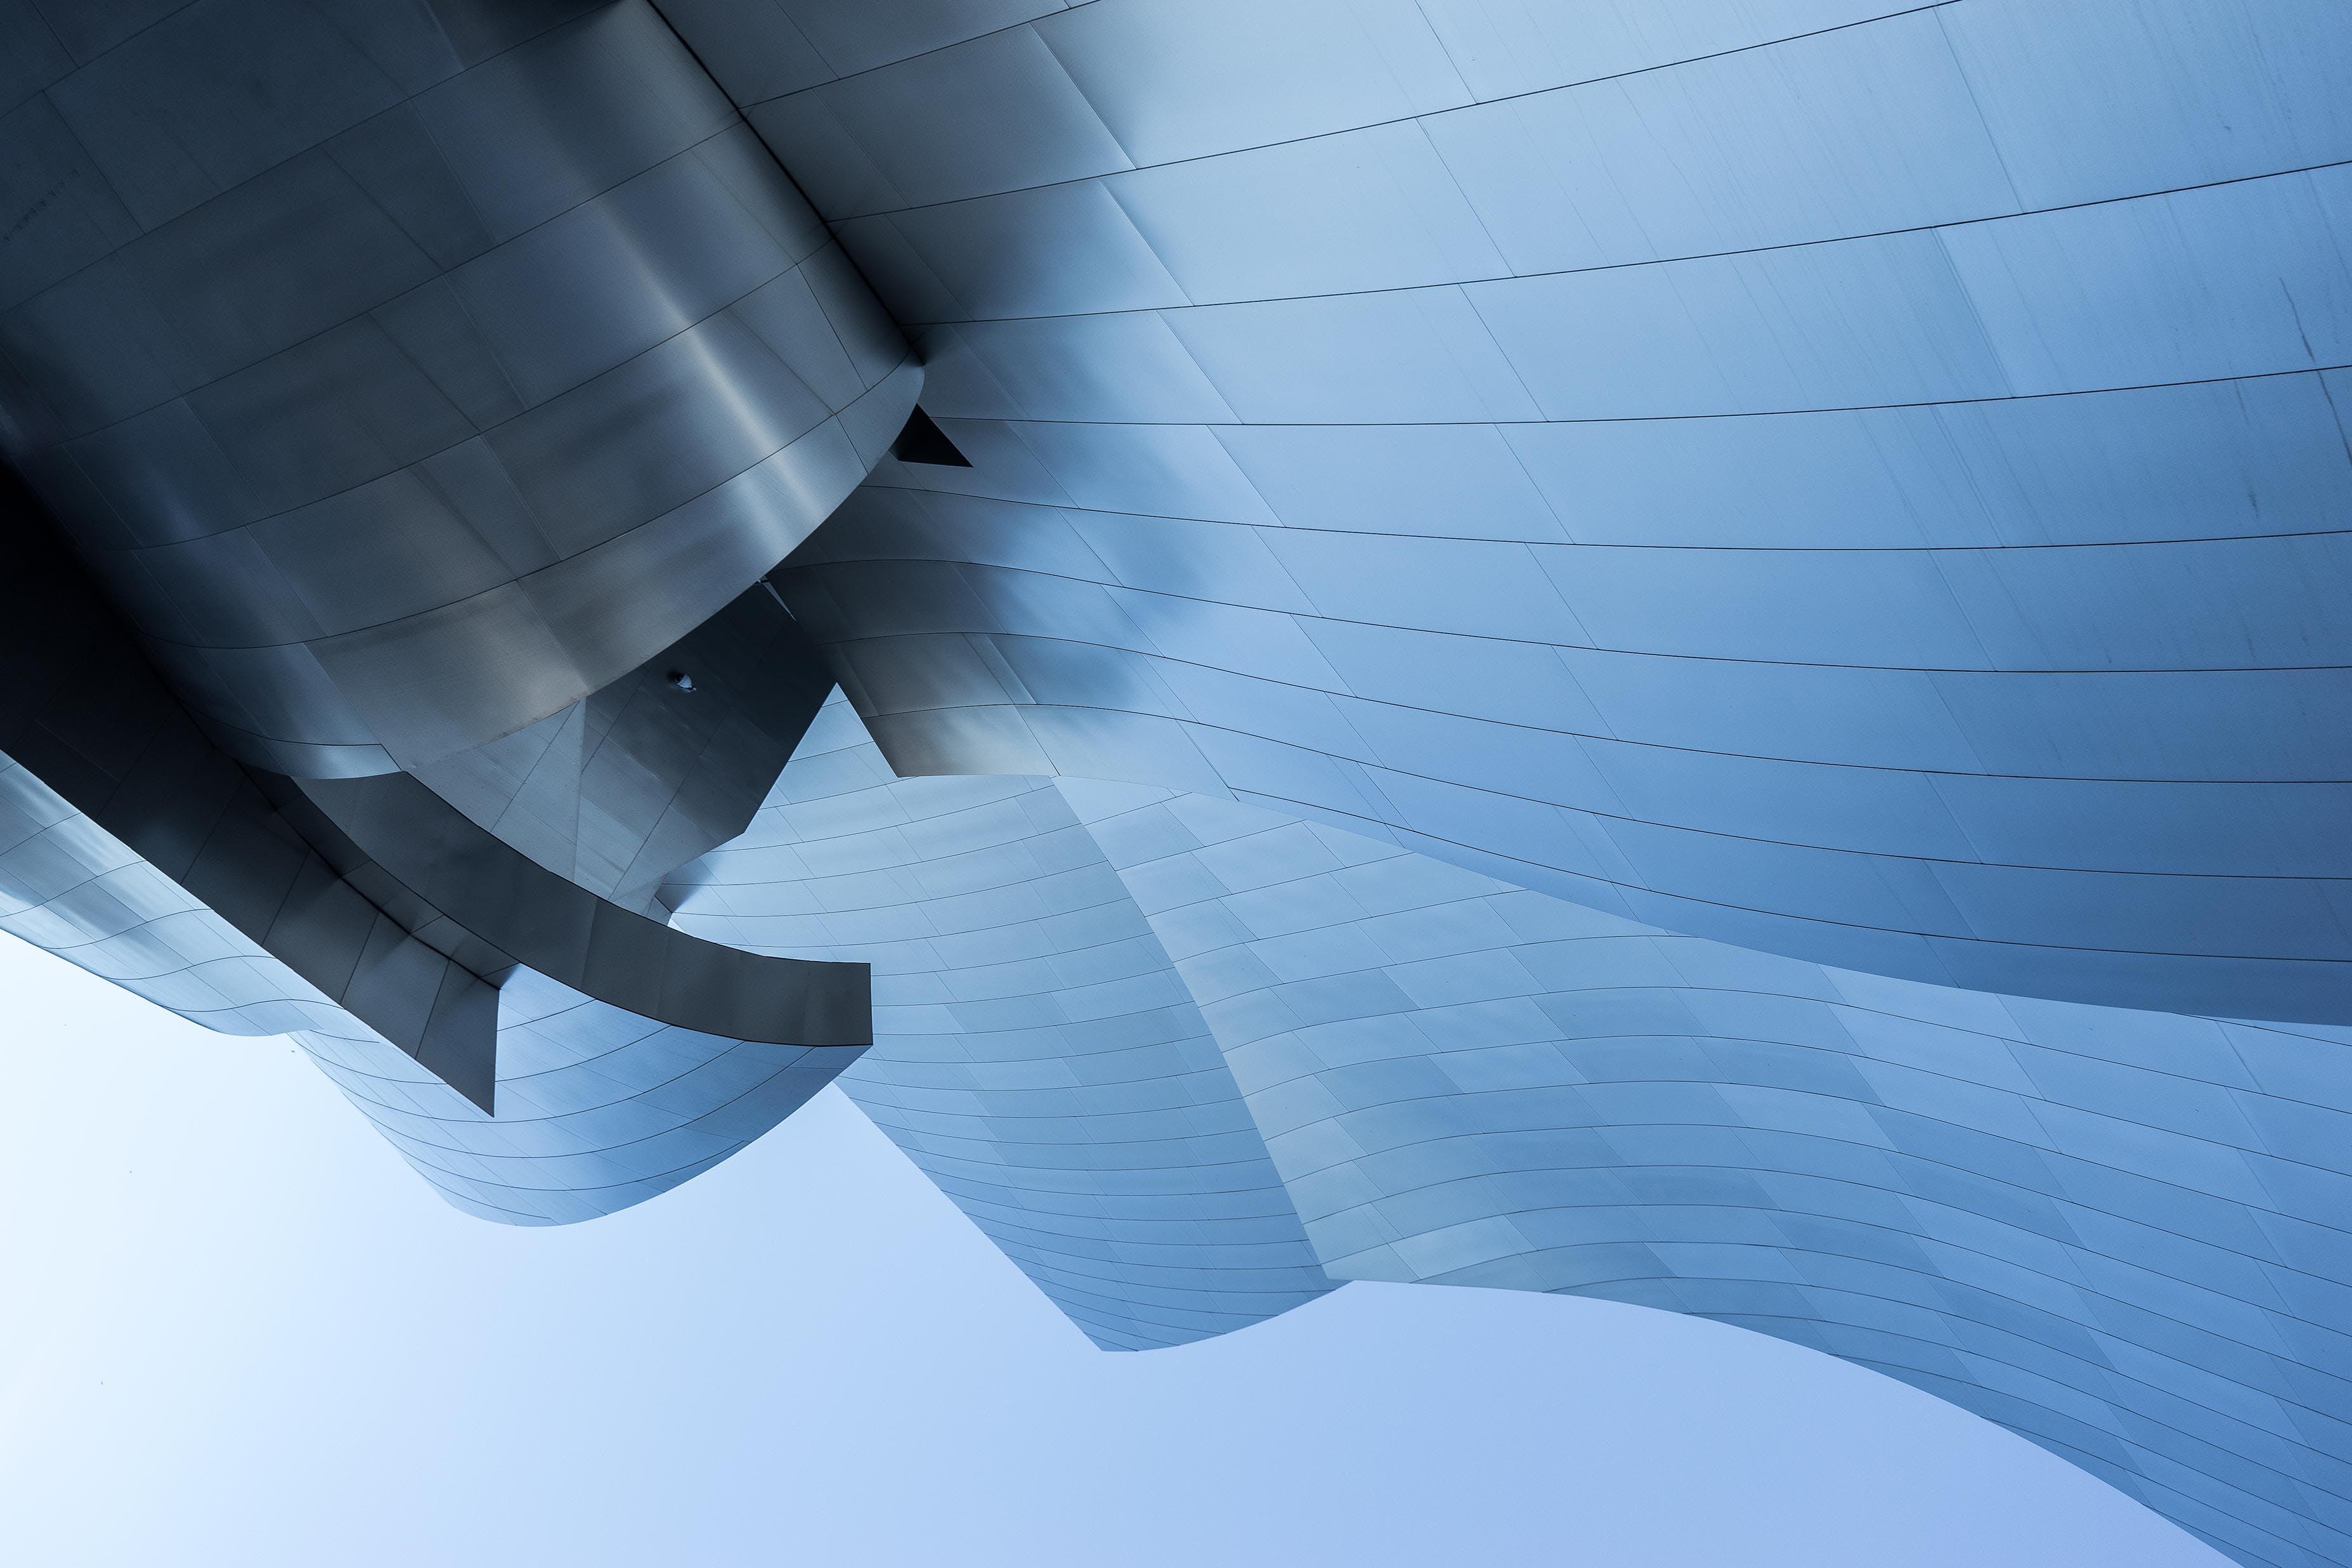 architectural design, blue sky, design